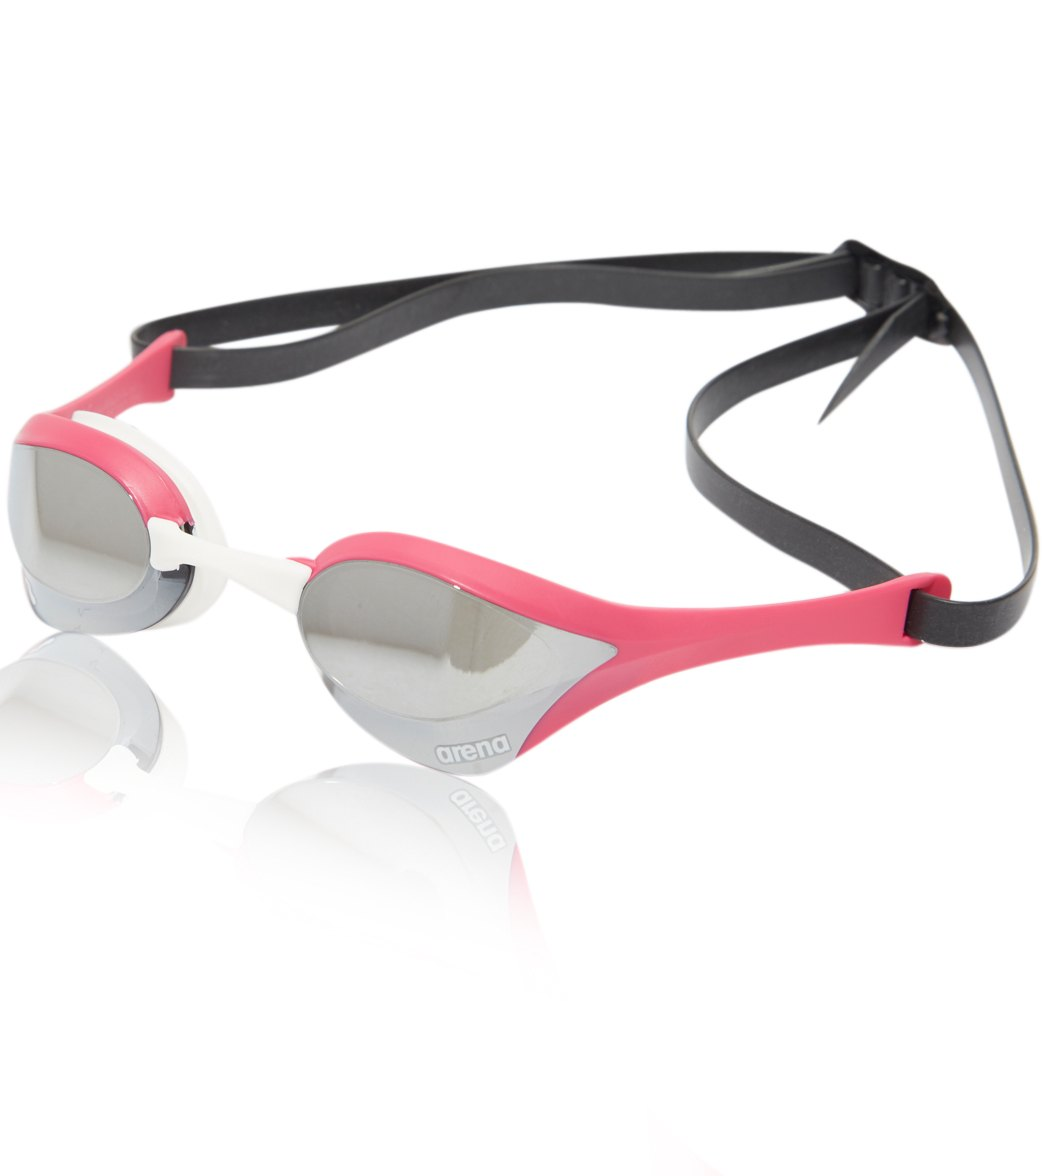 latest fashion highly praised Discover Arena Cobra Ultra Swipe Mirror Goggle